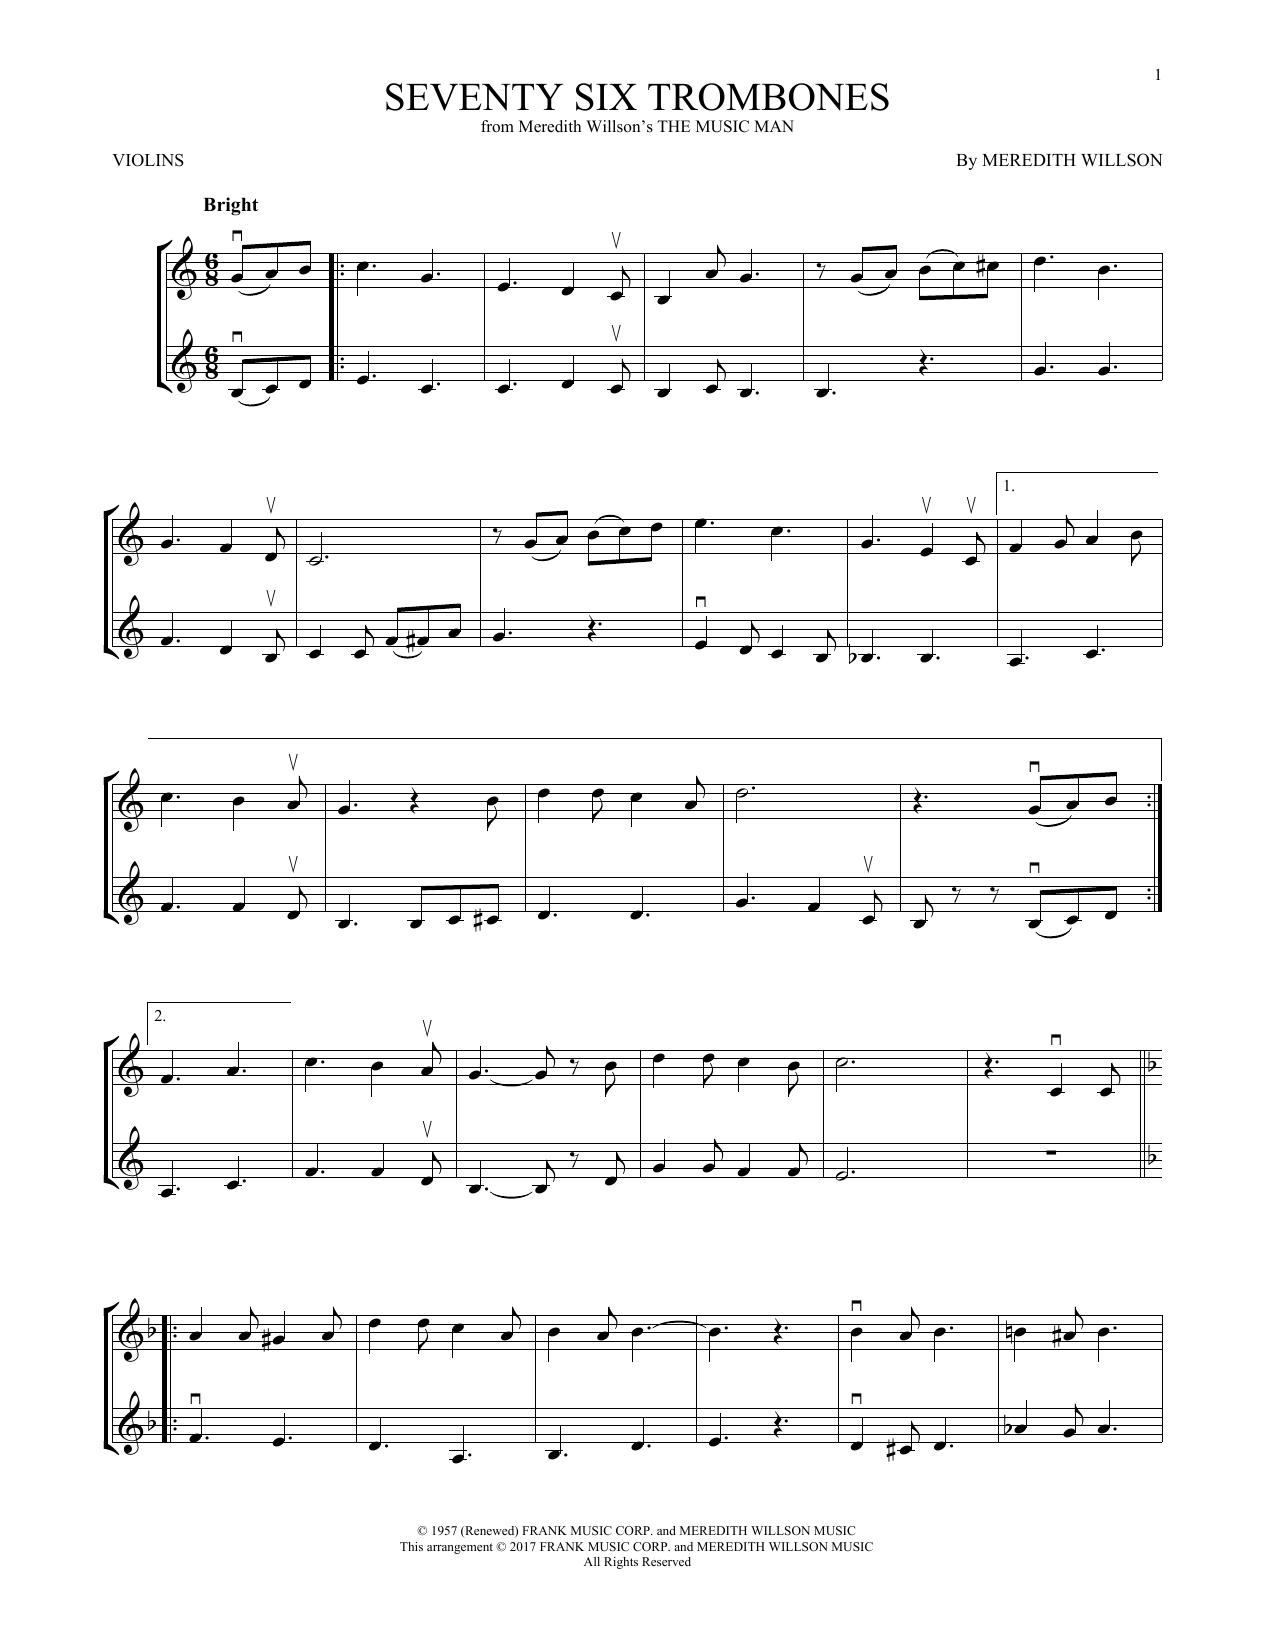 Seventy Six Trombones (from The Music Man) (Violin Duet)